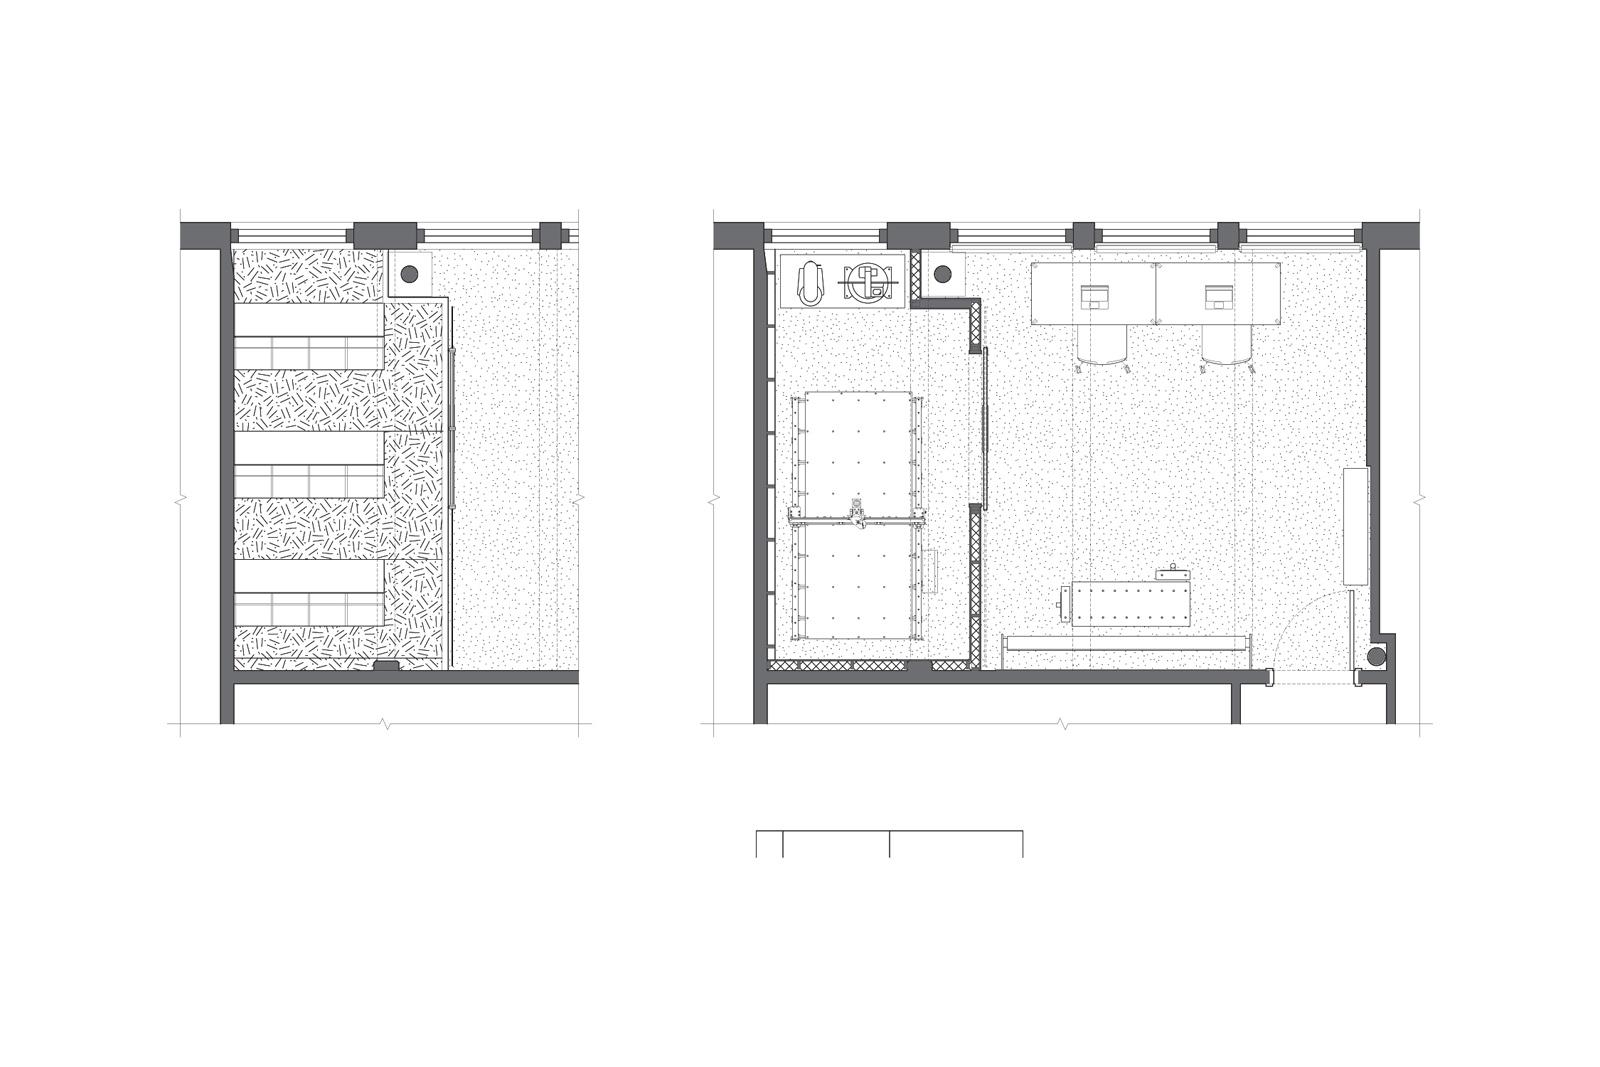 Floor plan of office and storage mezzanine